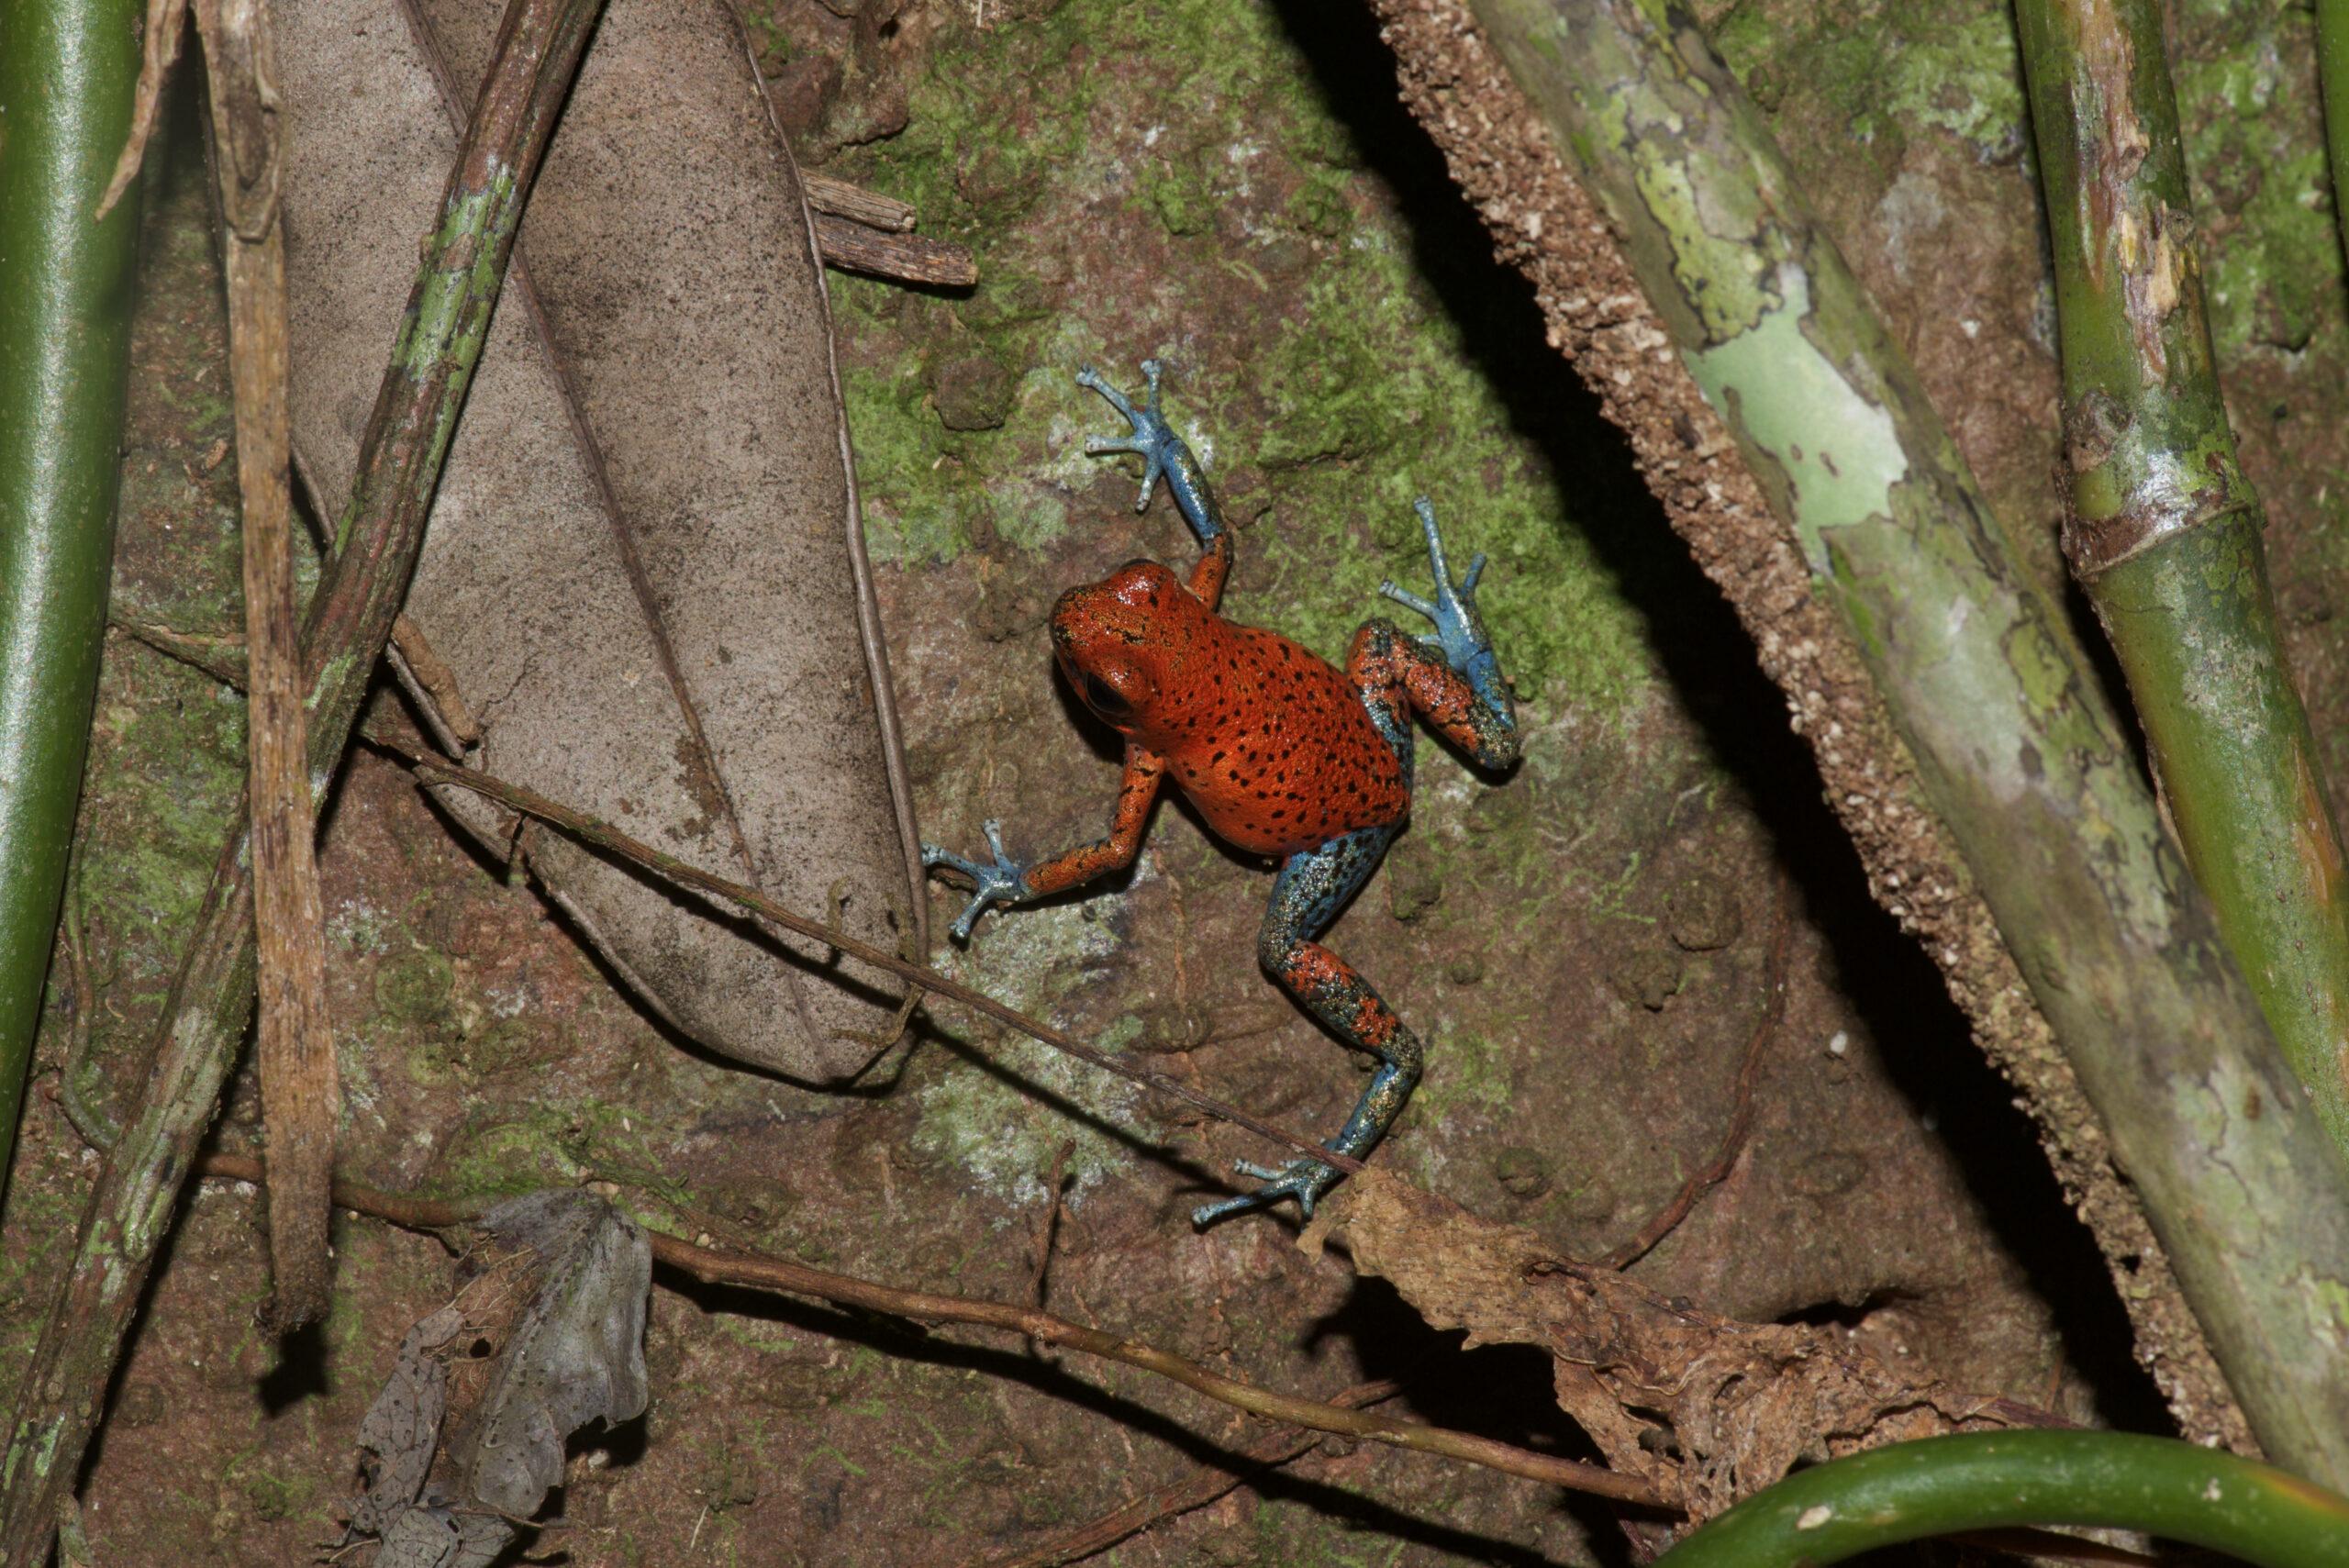 Oophaga pumilio from Isla Cristobal, Bocas del Toro, Panama - by E. Van Heygen.